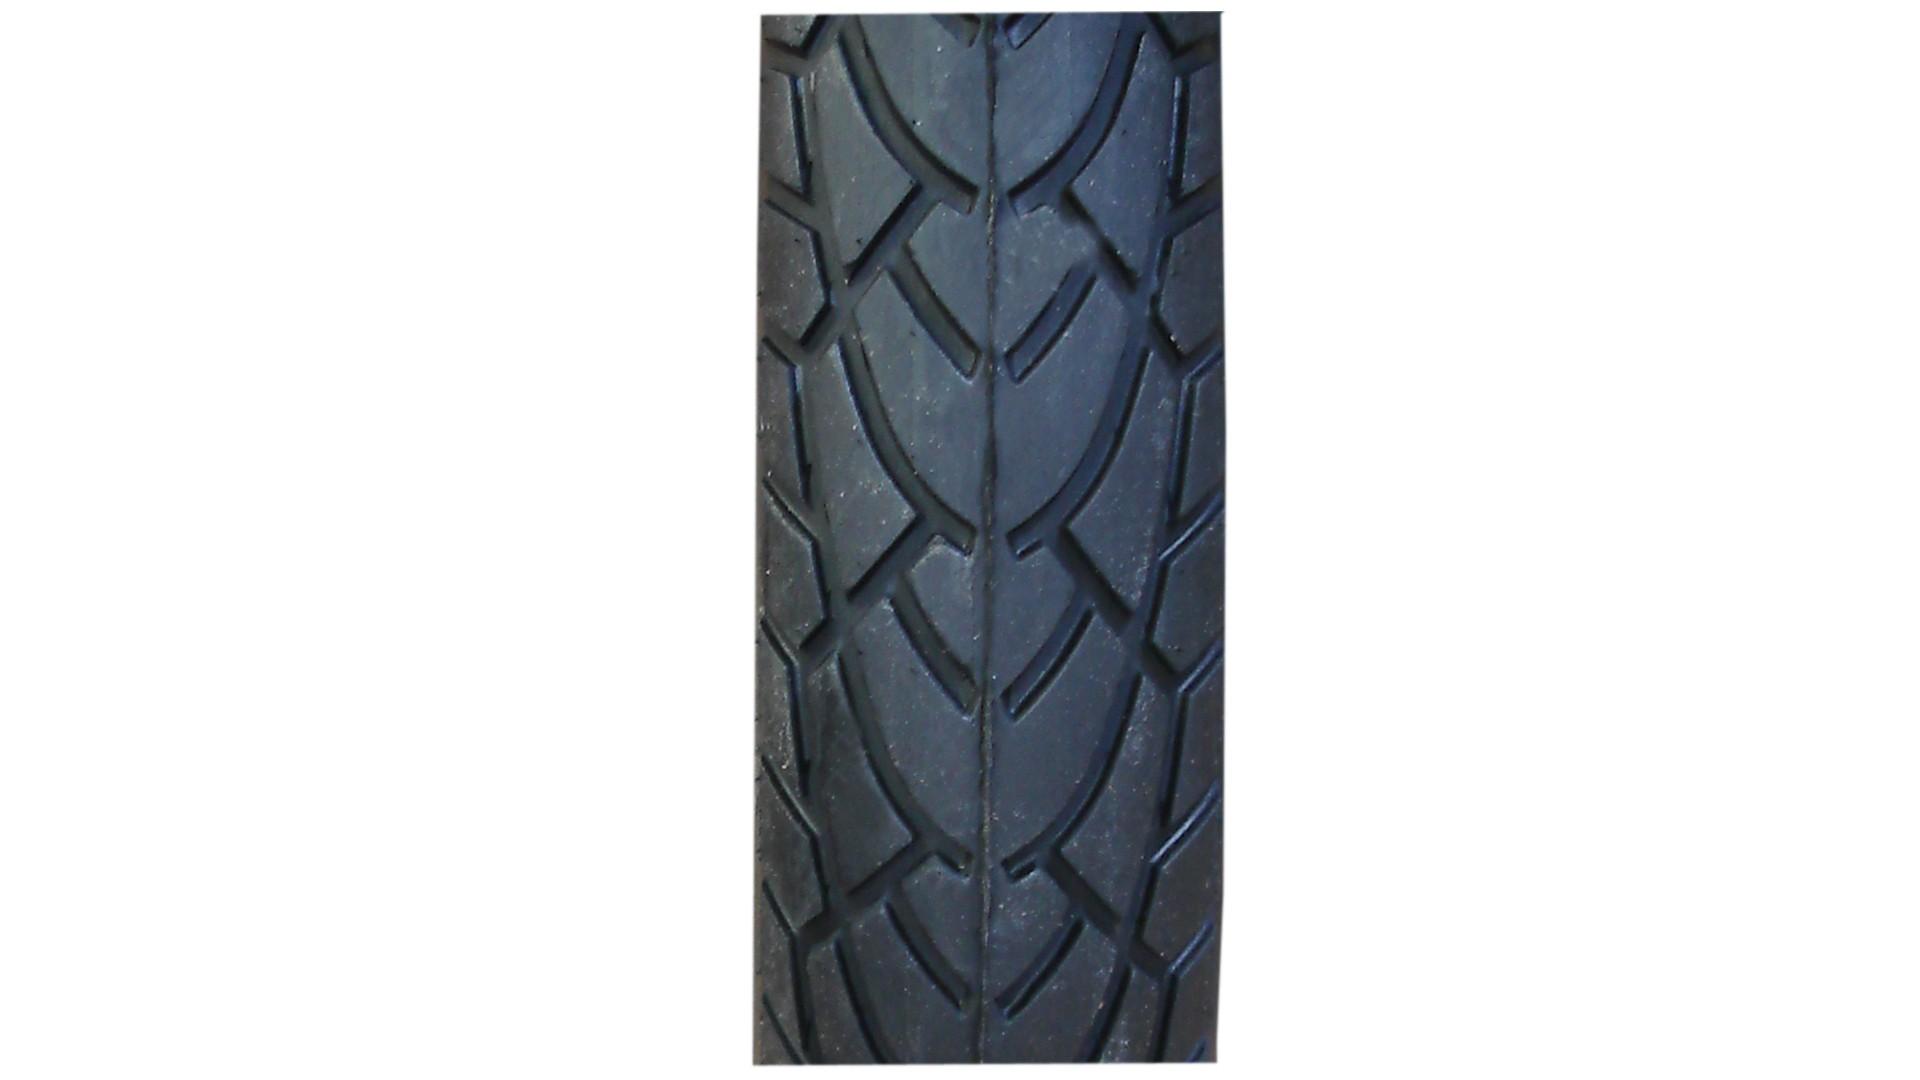 Покрышка RUBENA 10 x 1.75*2 (47x152) WALRUS V41 Pre Classic 22 черная